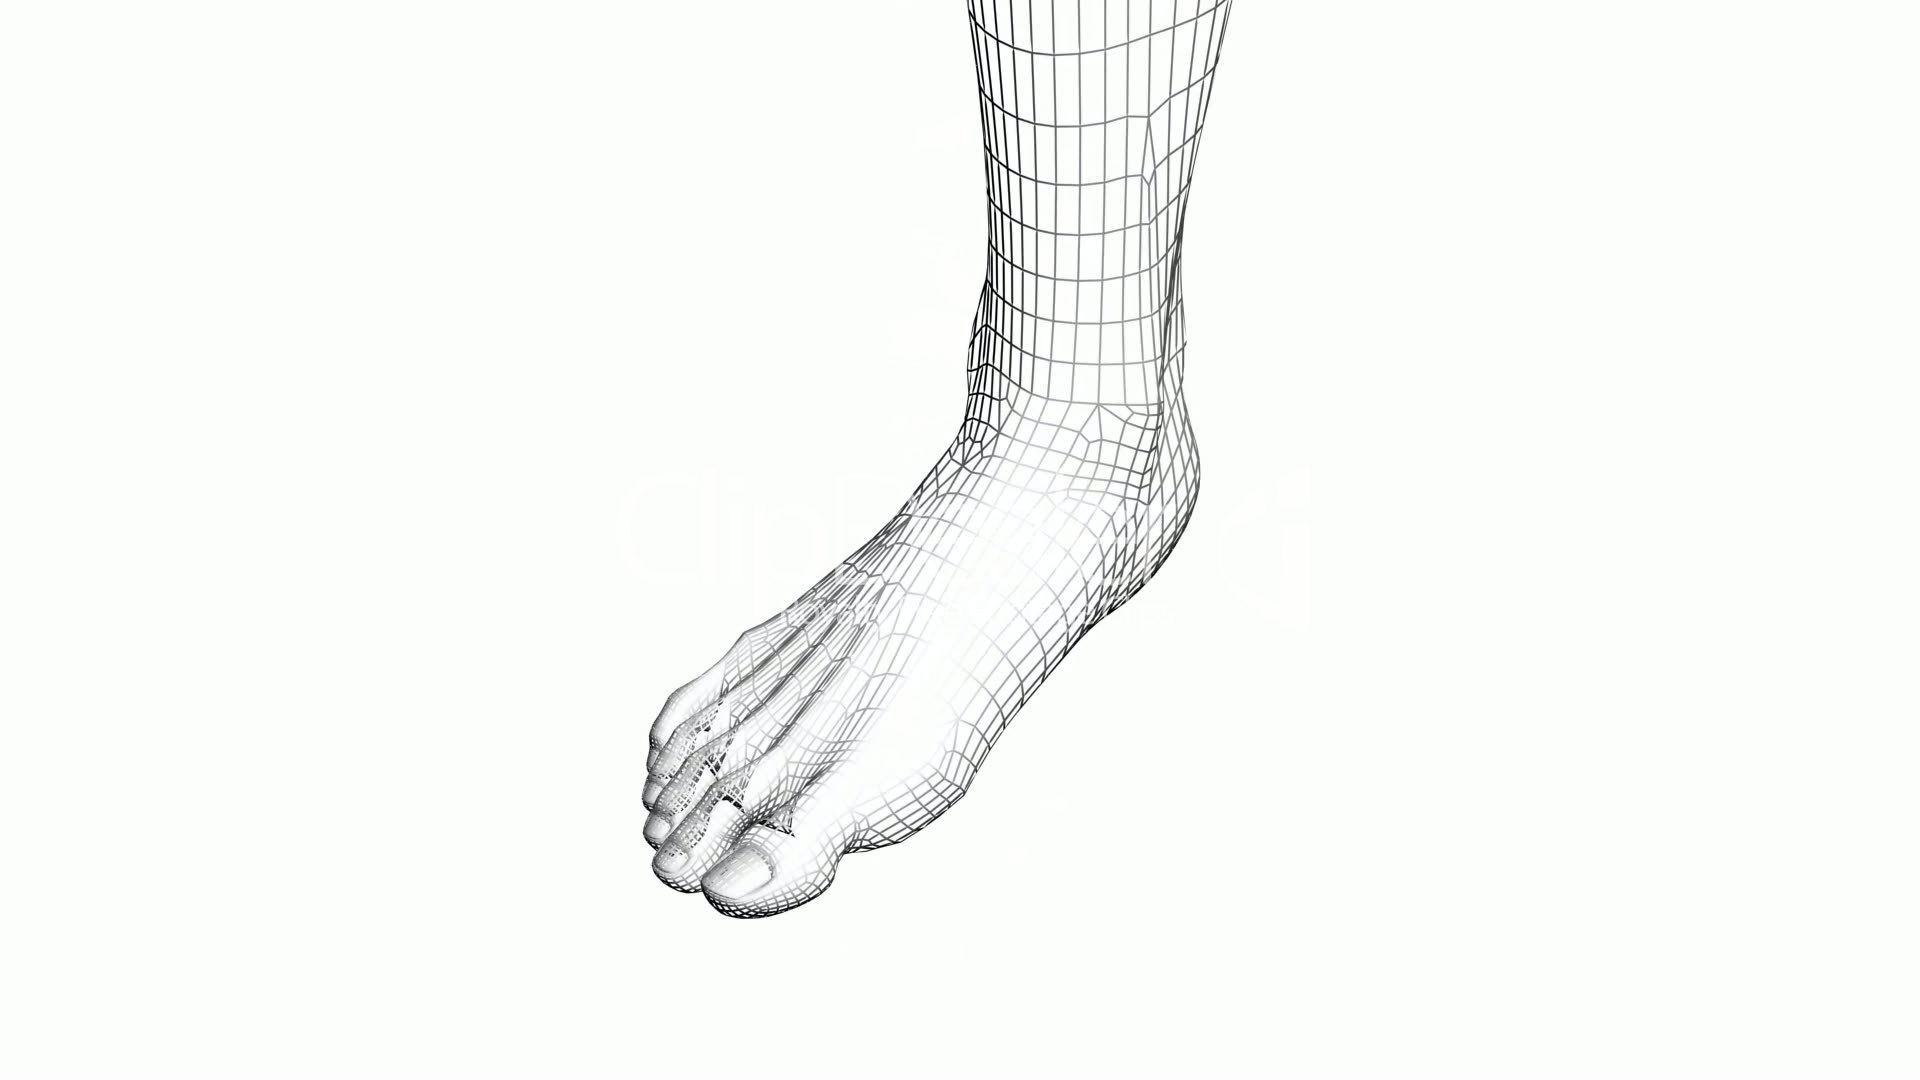 1920x1080 Rotation Of 3d Foot.leg,health,barefoot,foot,beauty,care,human